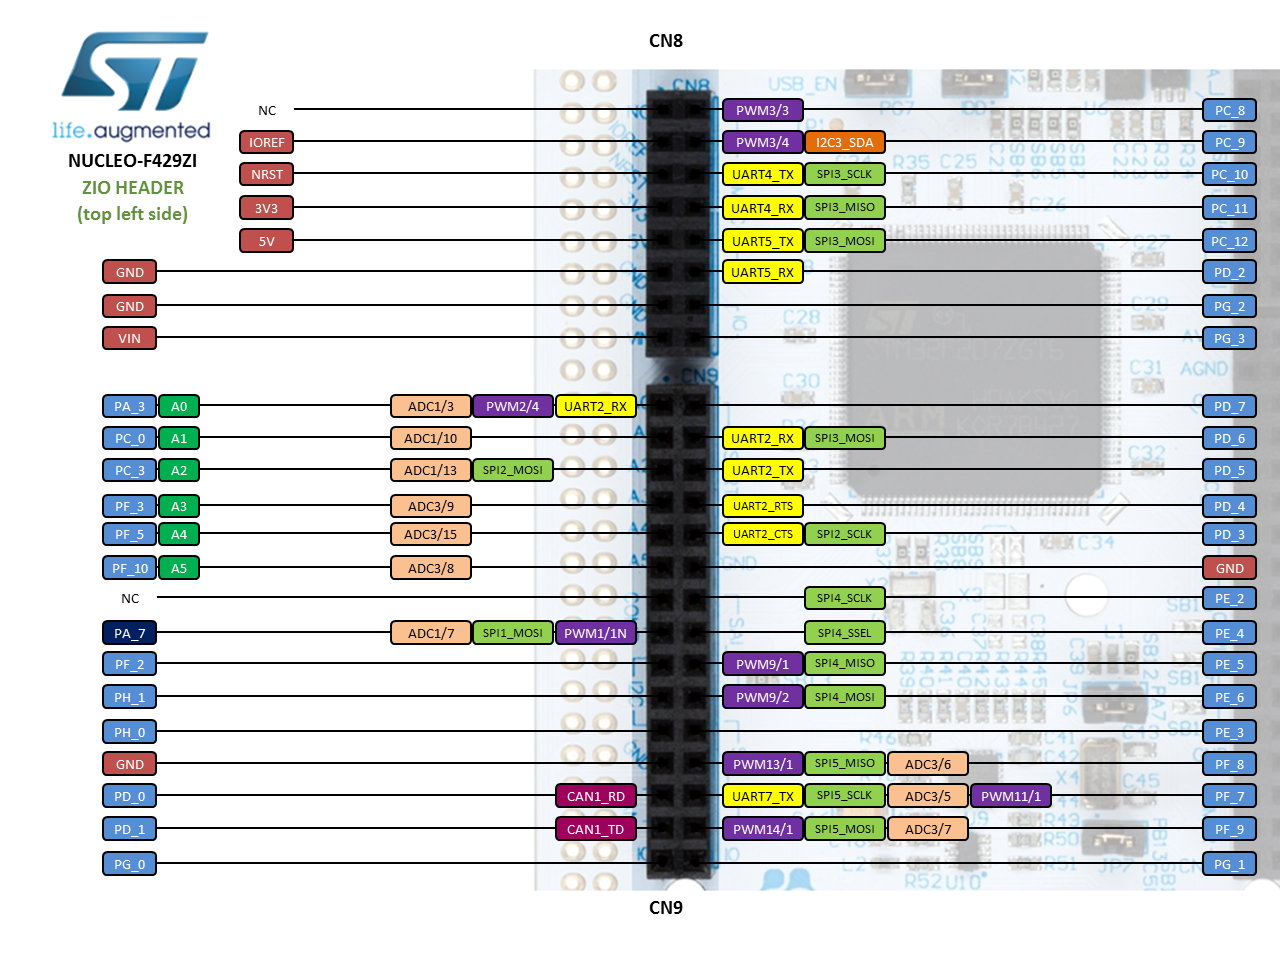 NUCLEO-F429ZI | Mbed